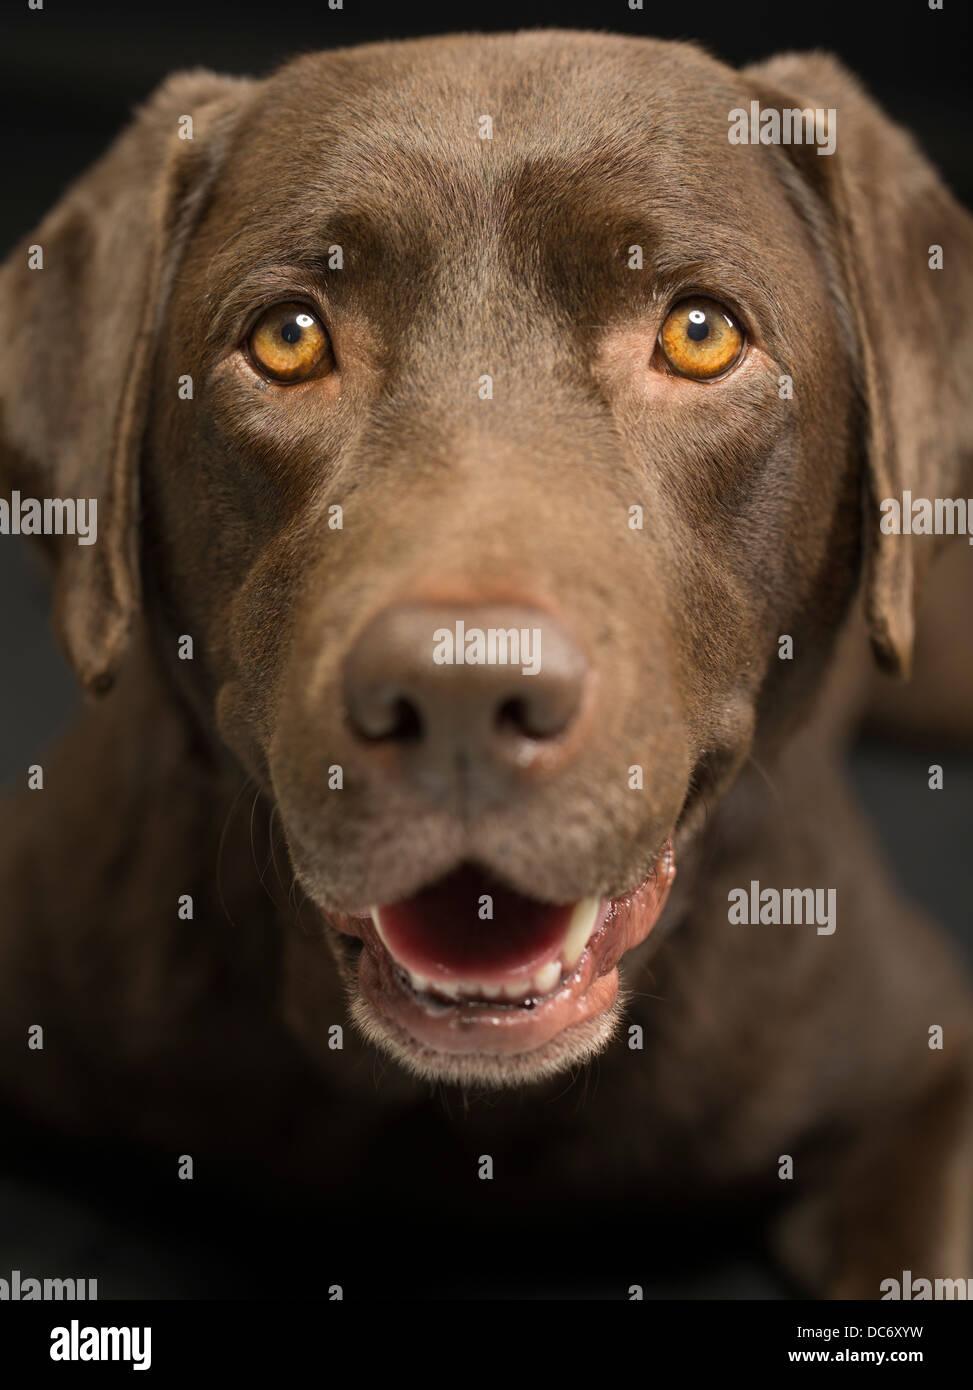 Chocolate labrador Retriever studio portrait - Stock Image